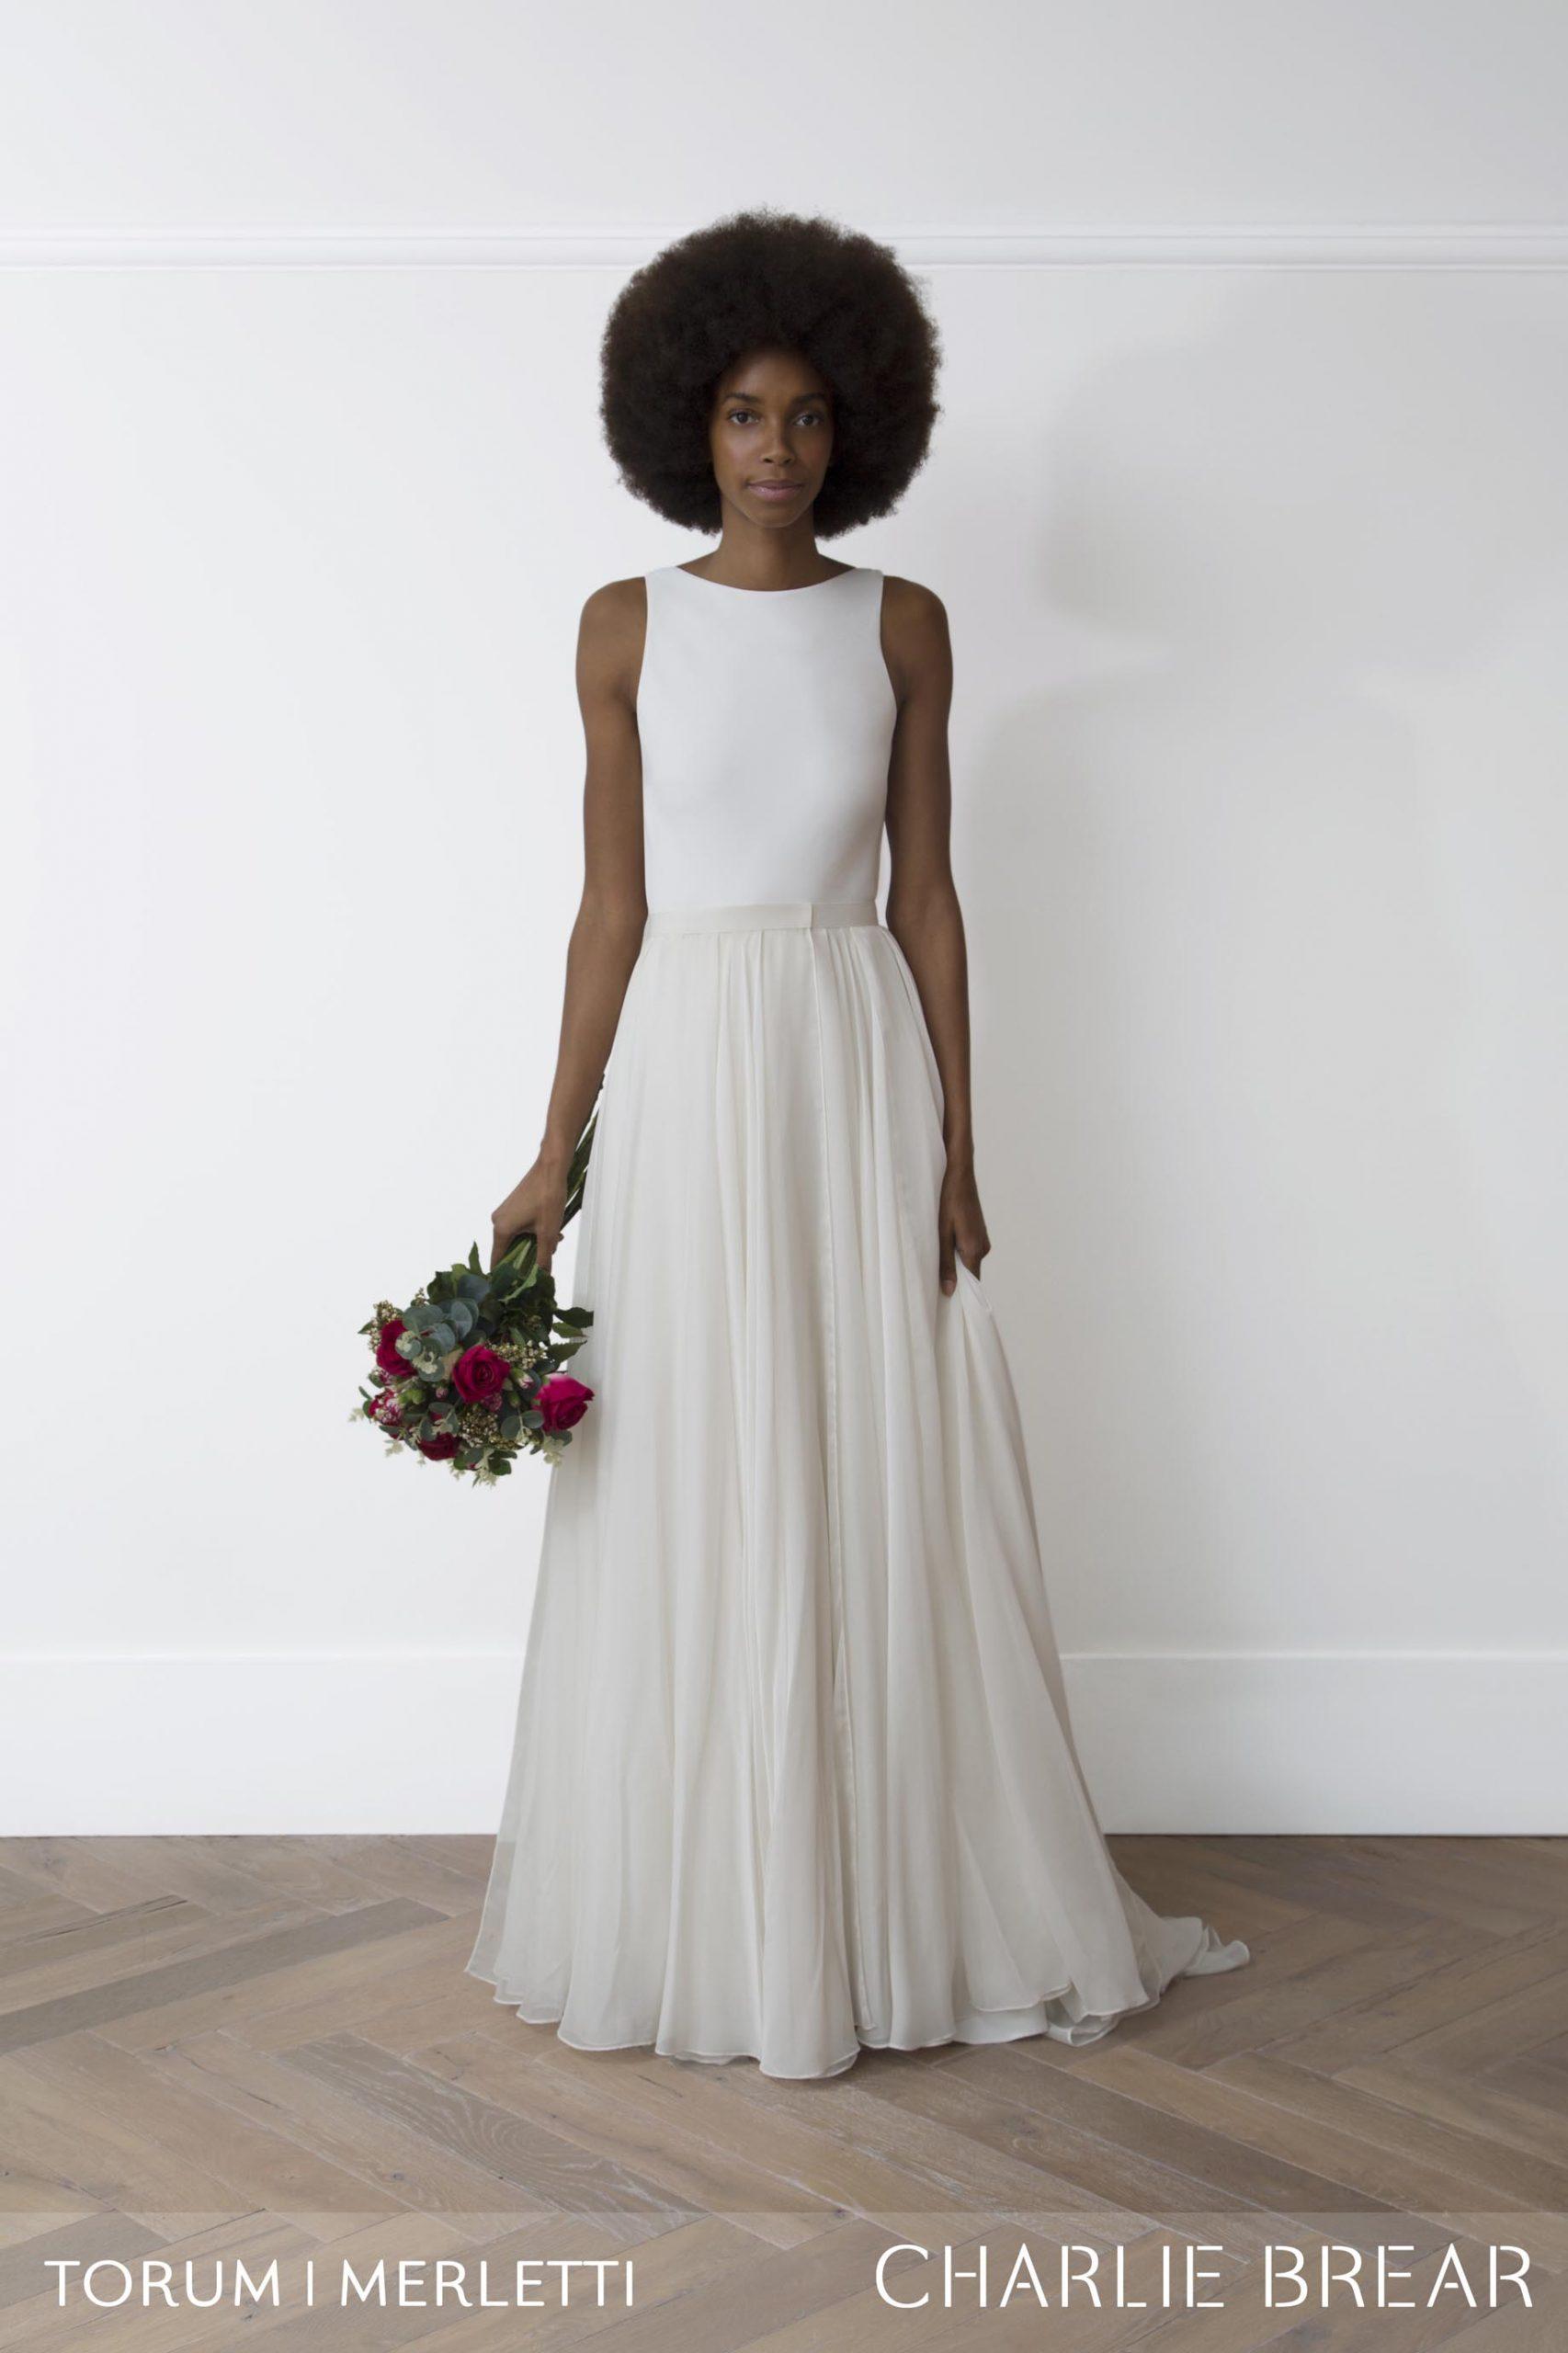 Torum Dress and Merletti Overskirt